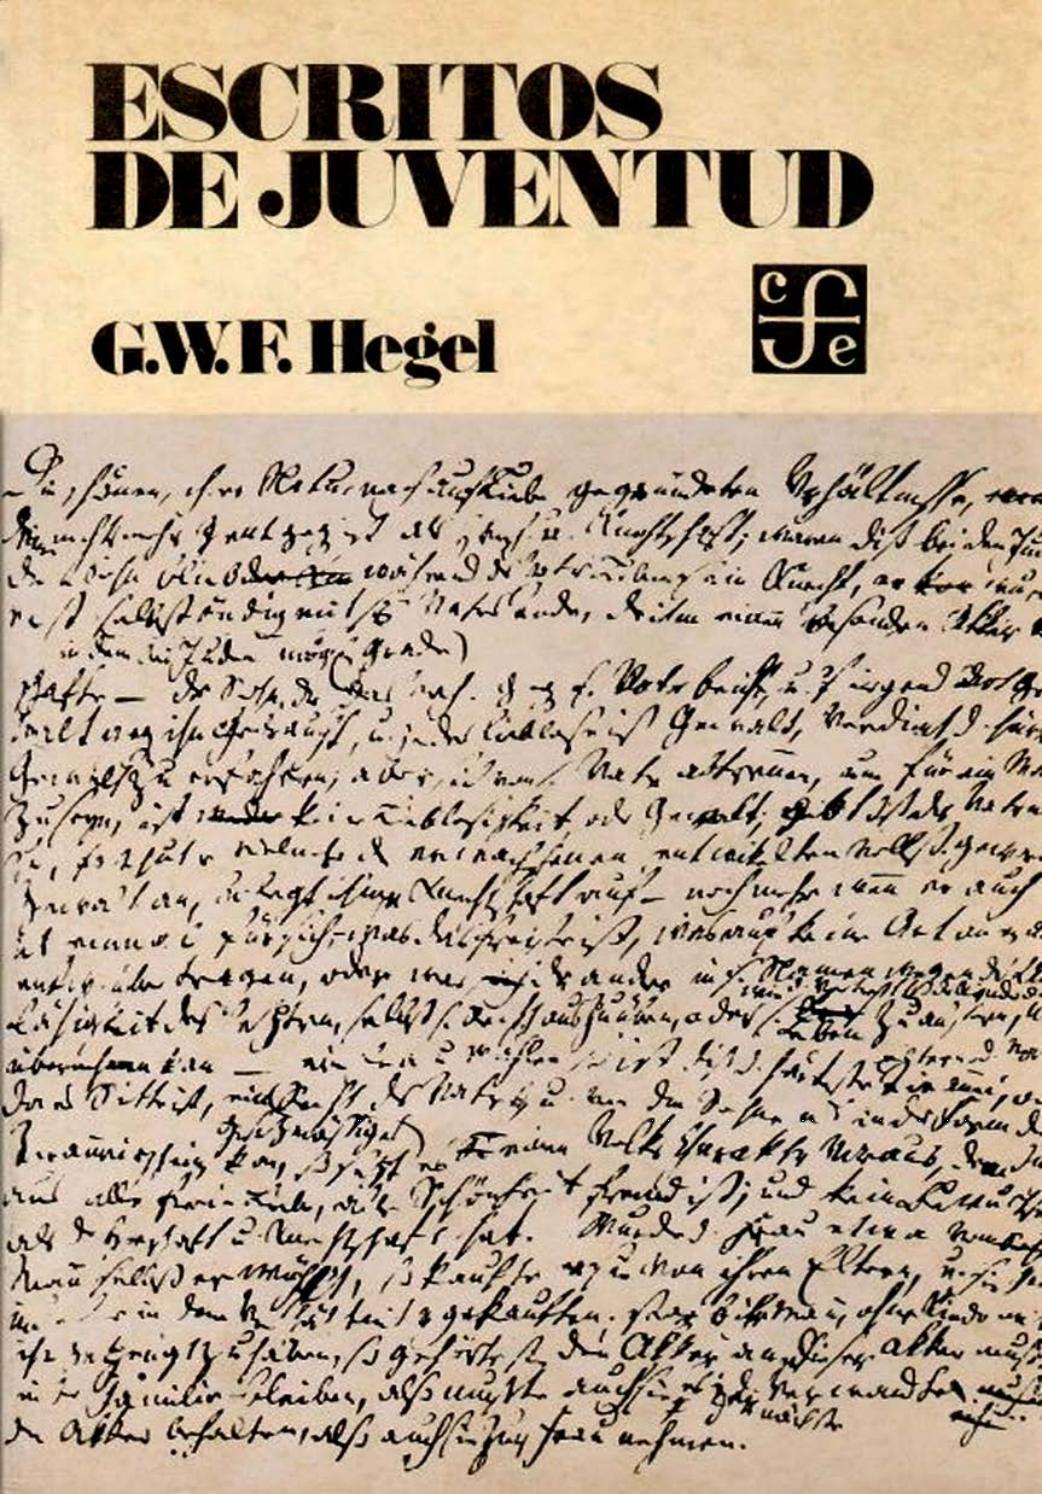 Escritos de juventud - G.W.F. Hegel by Txavo Hesiaren - issuu